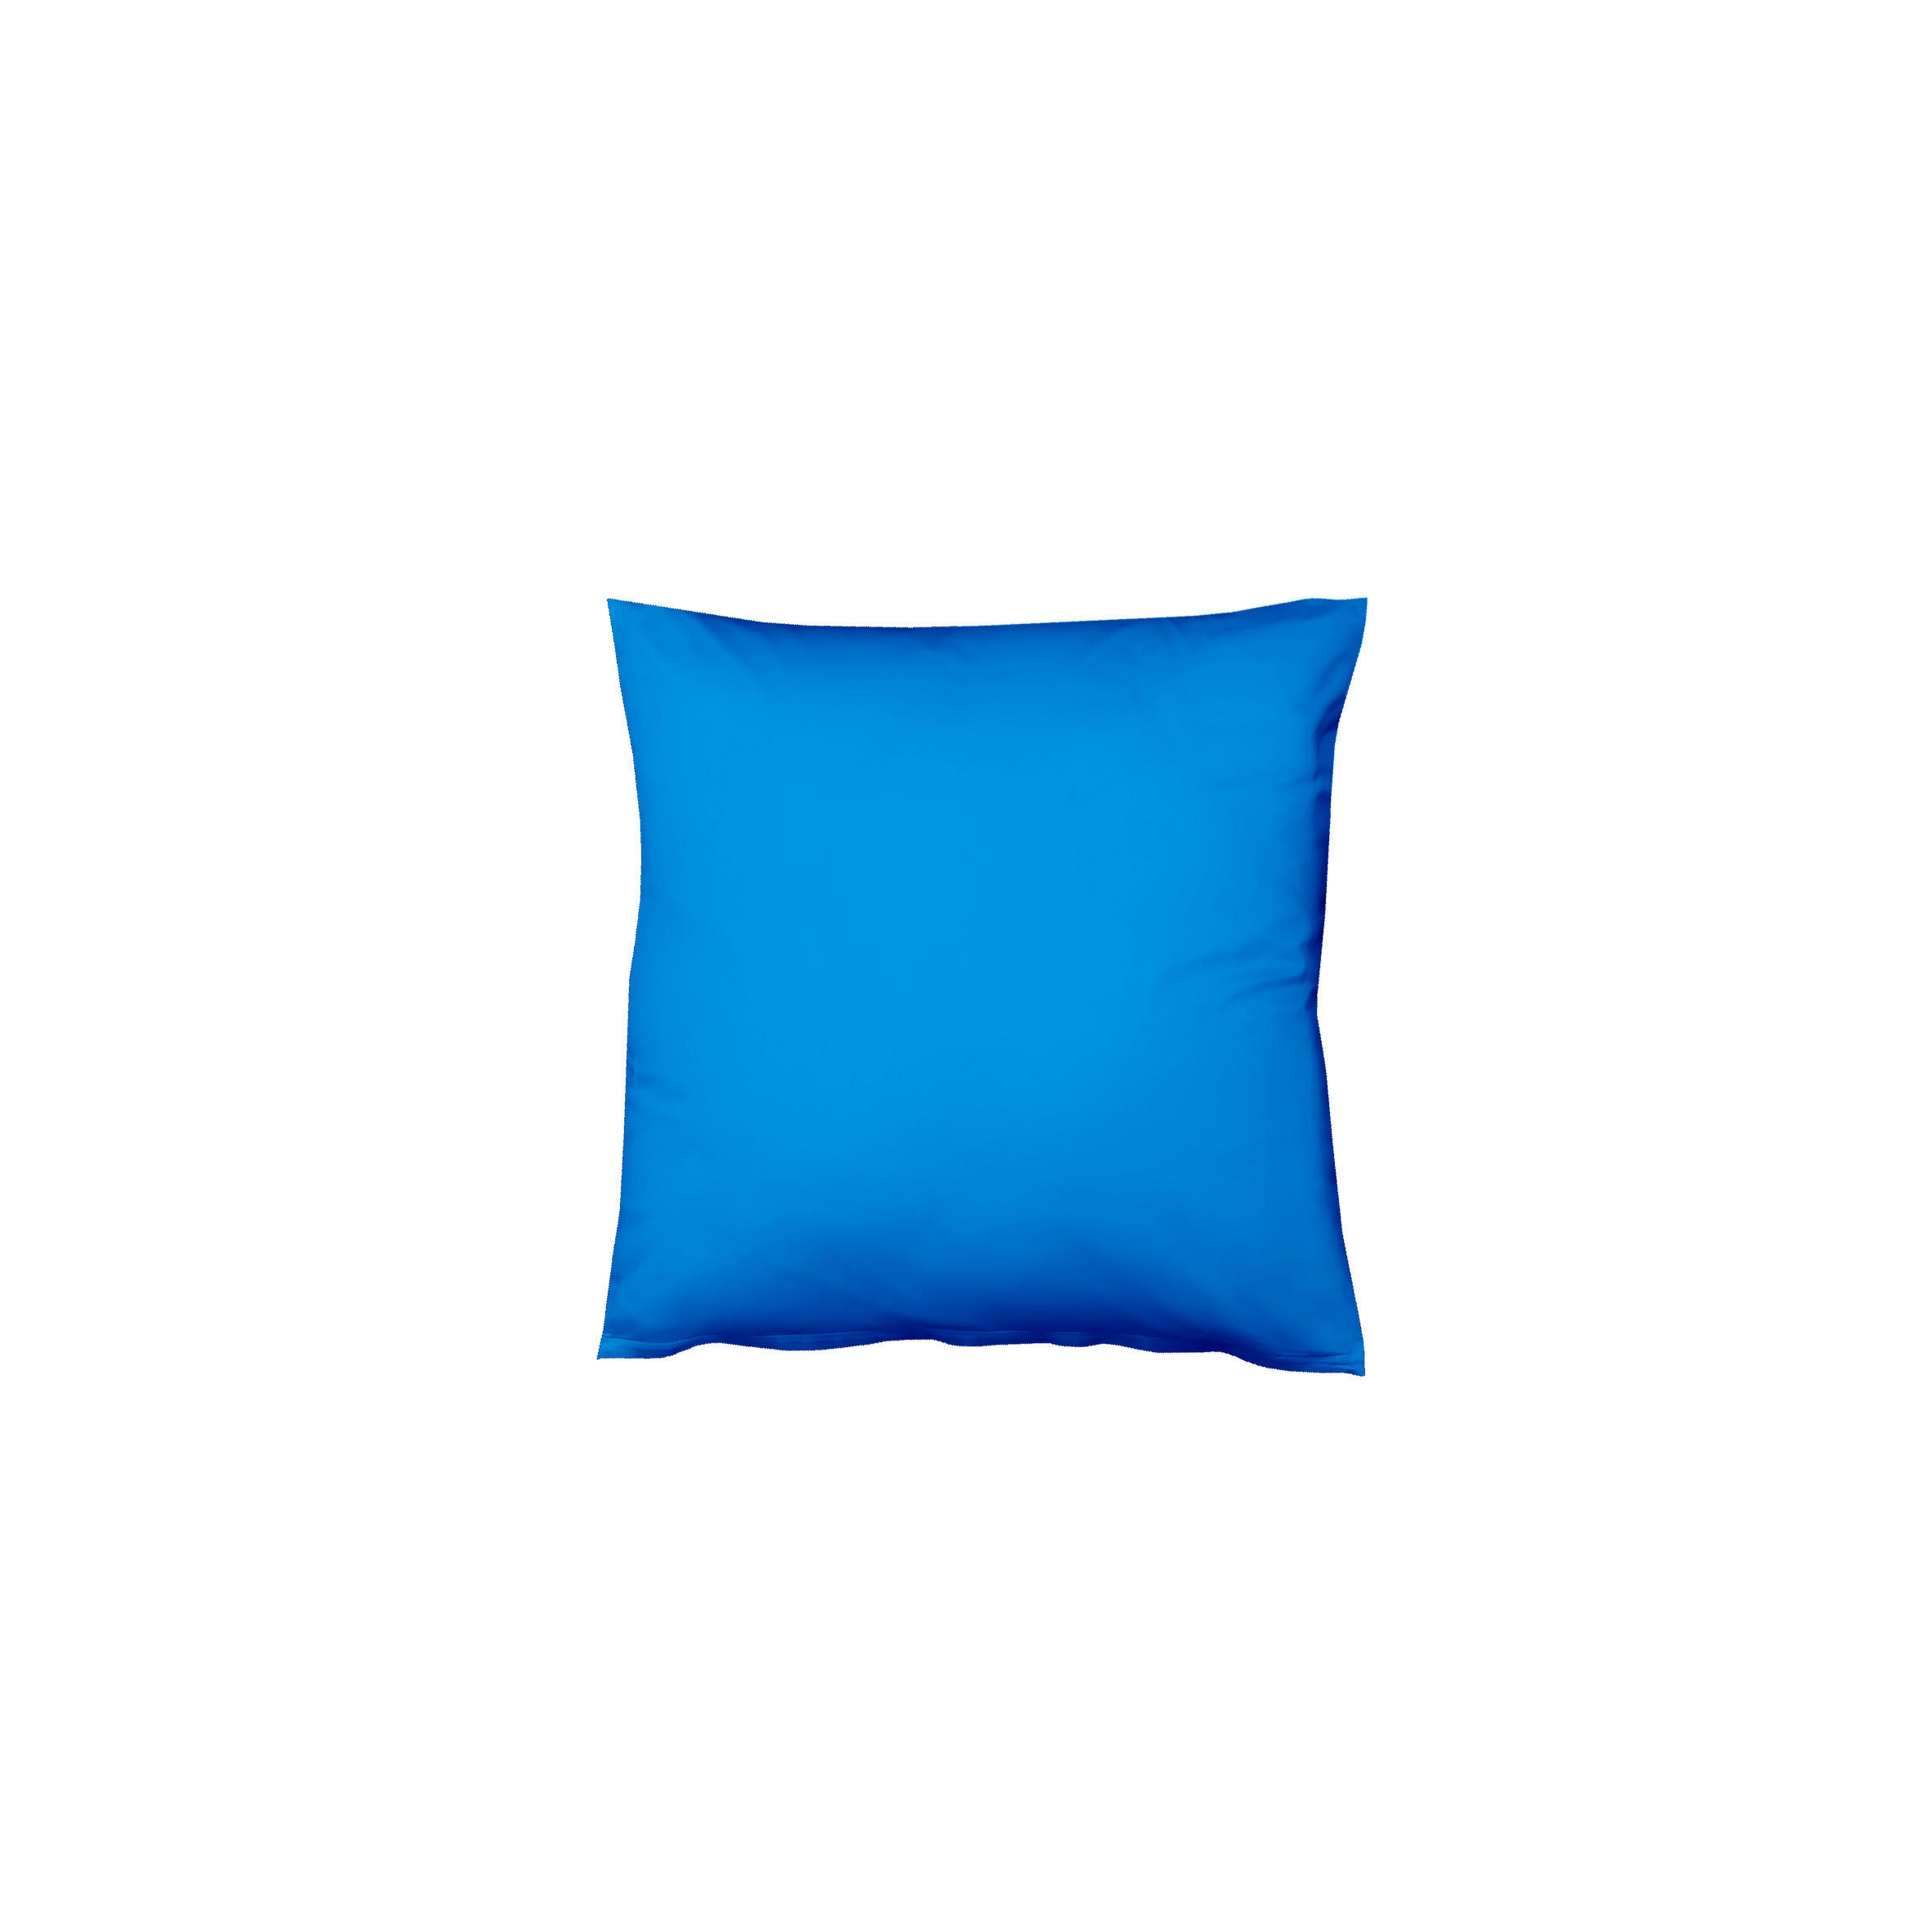 KISSENHÜLLE Blau 80/80 cm - Blau, Basics, Textil (80/80cm) - FLEURESSE